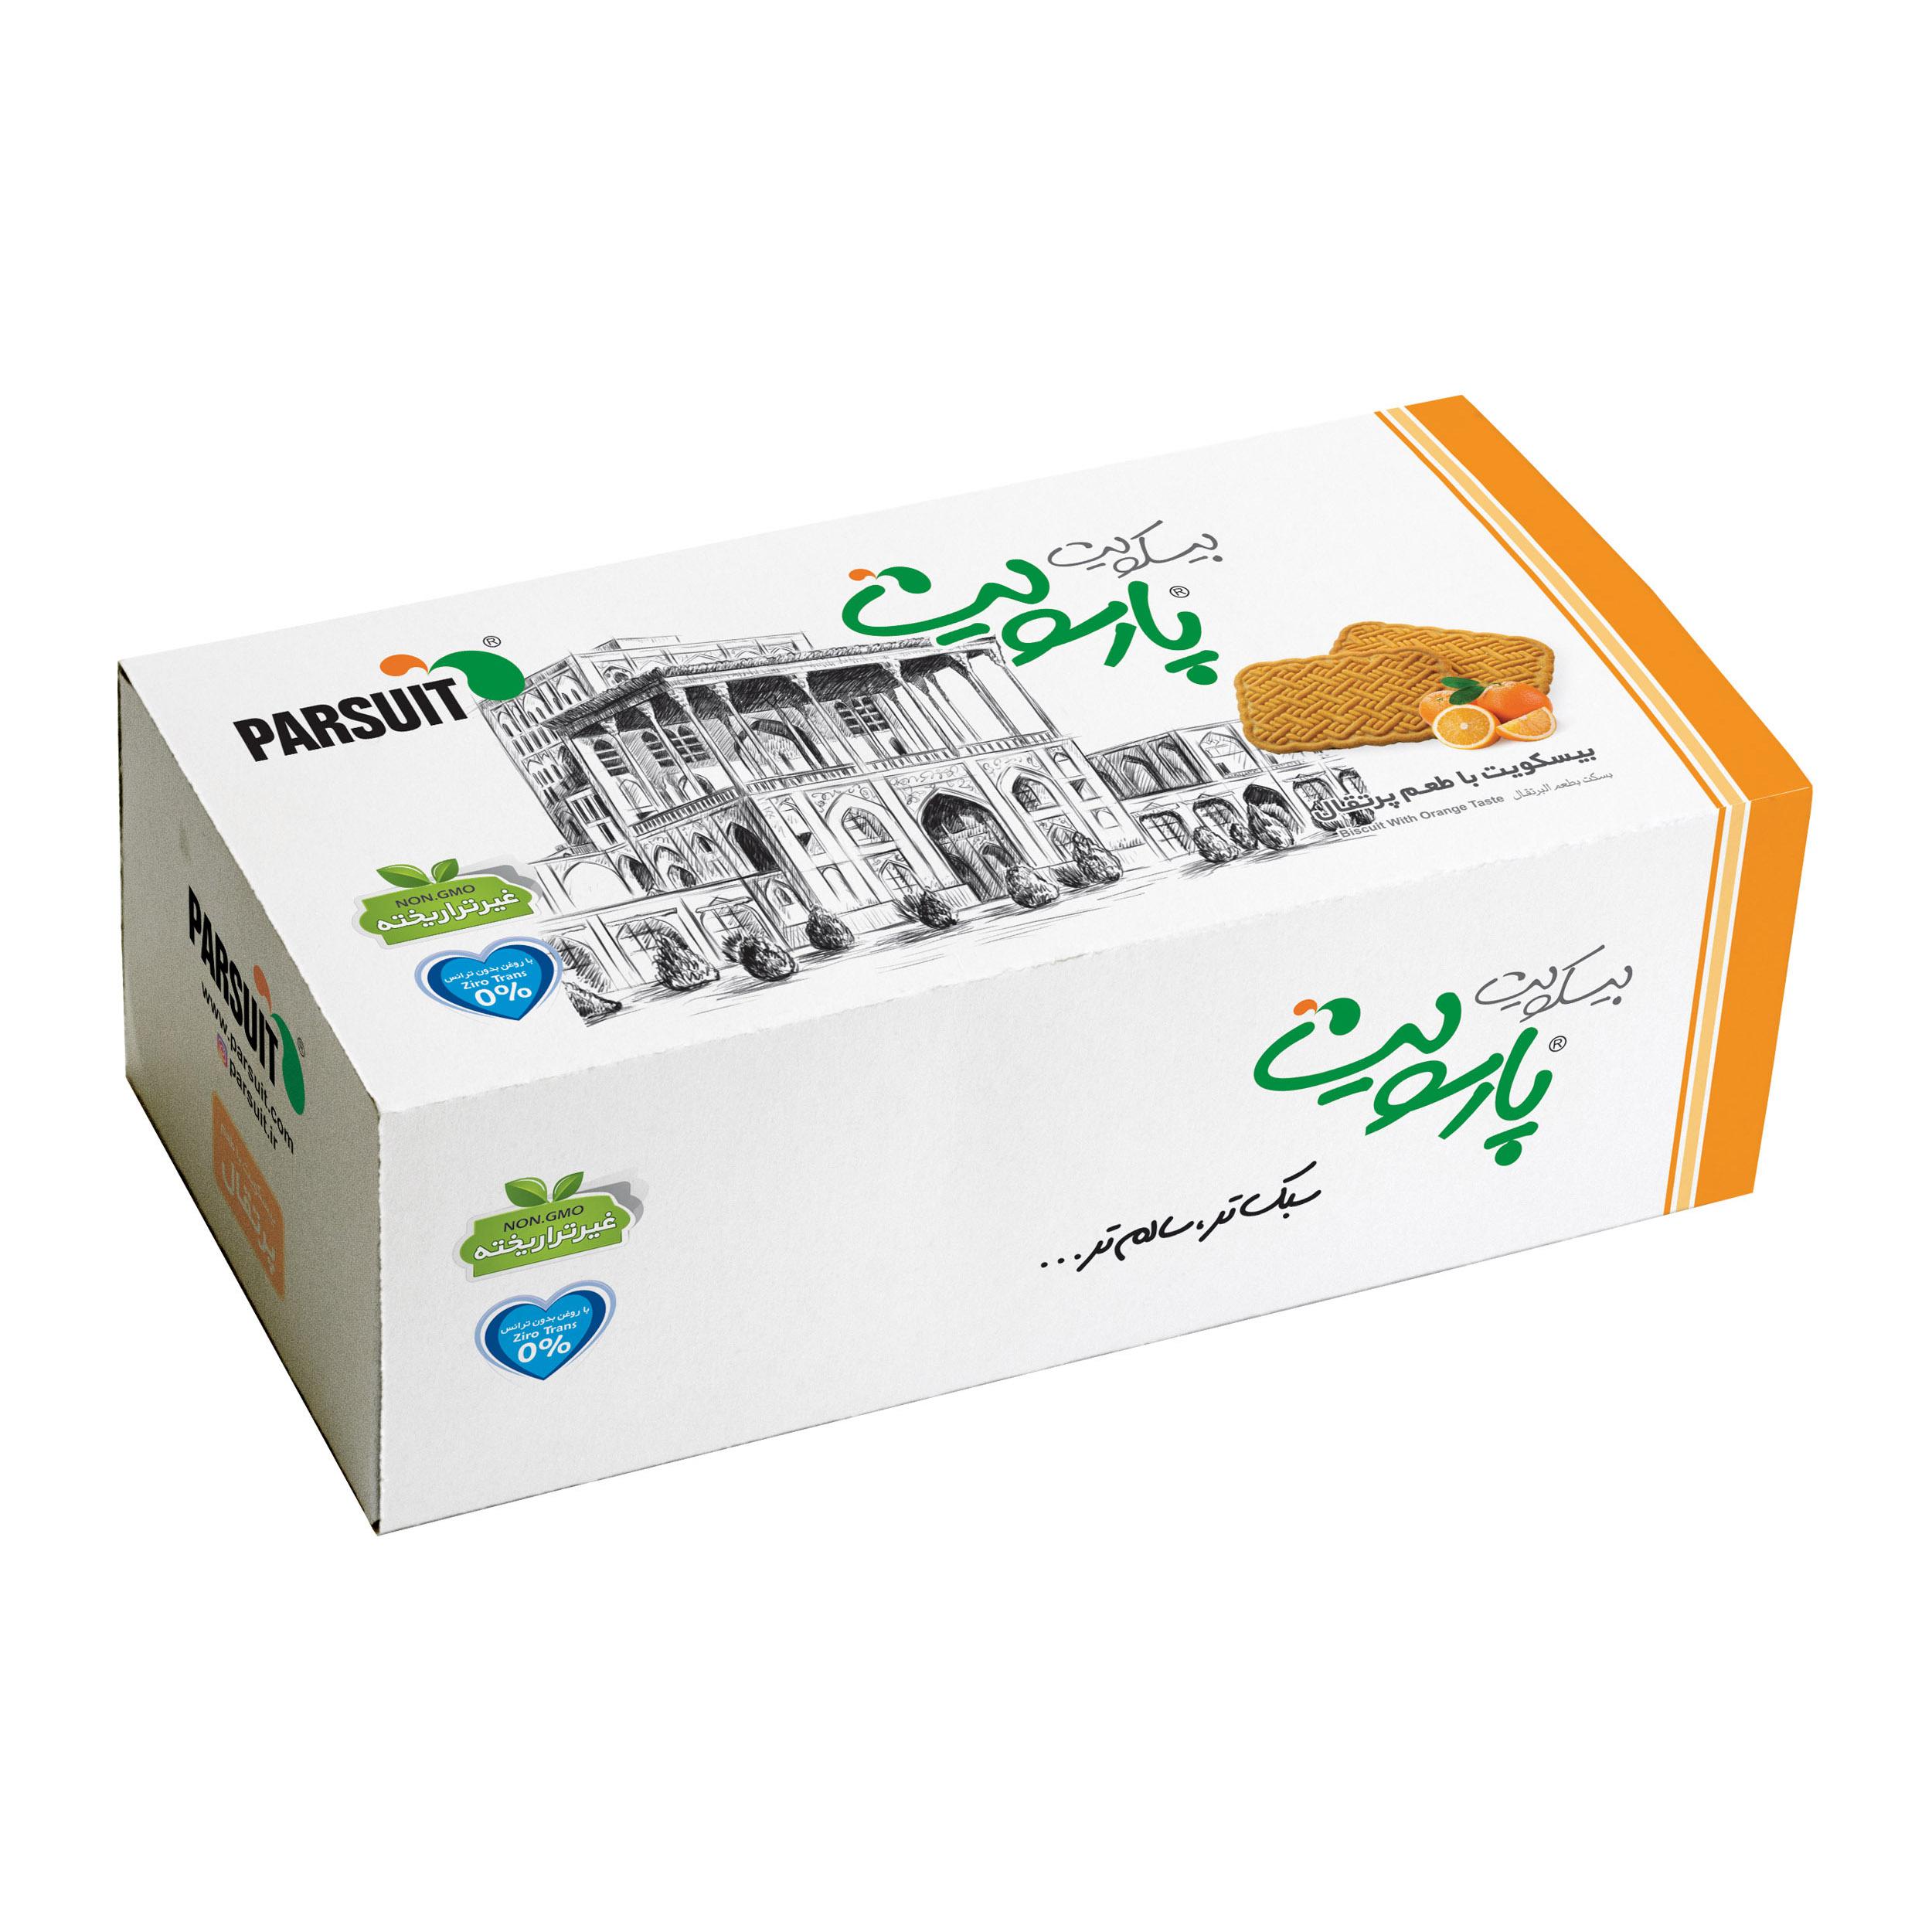 بیسکویت با طعم پرتقال پارسویت - 450 گرم